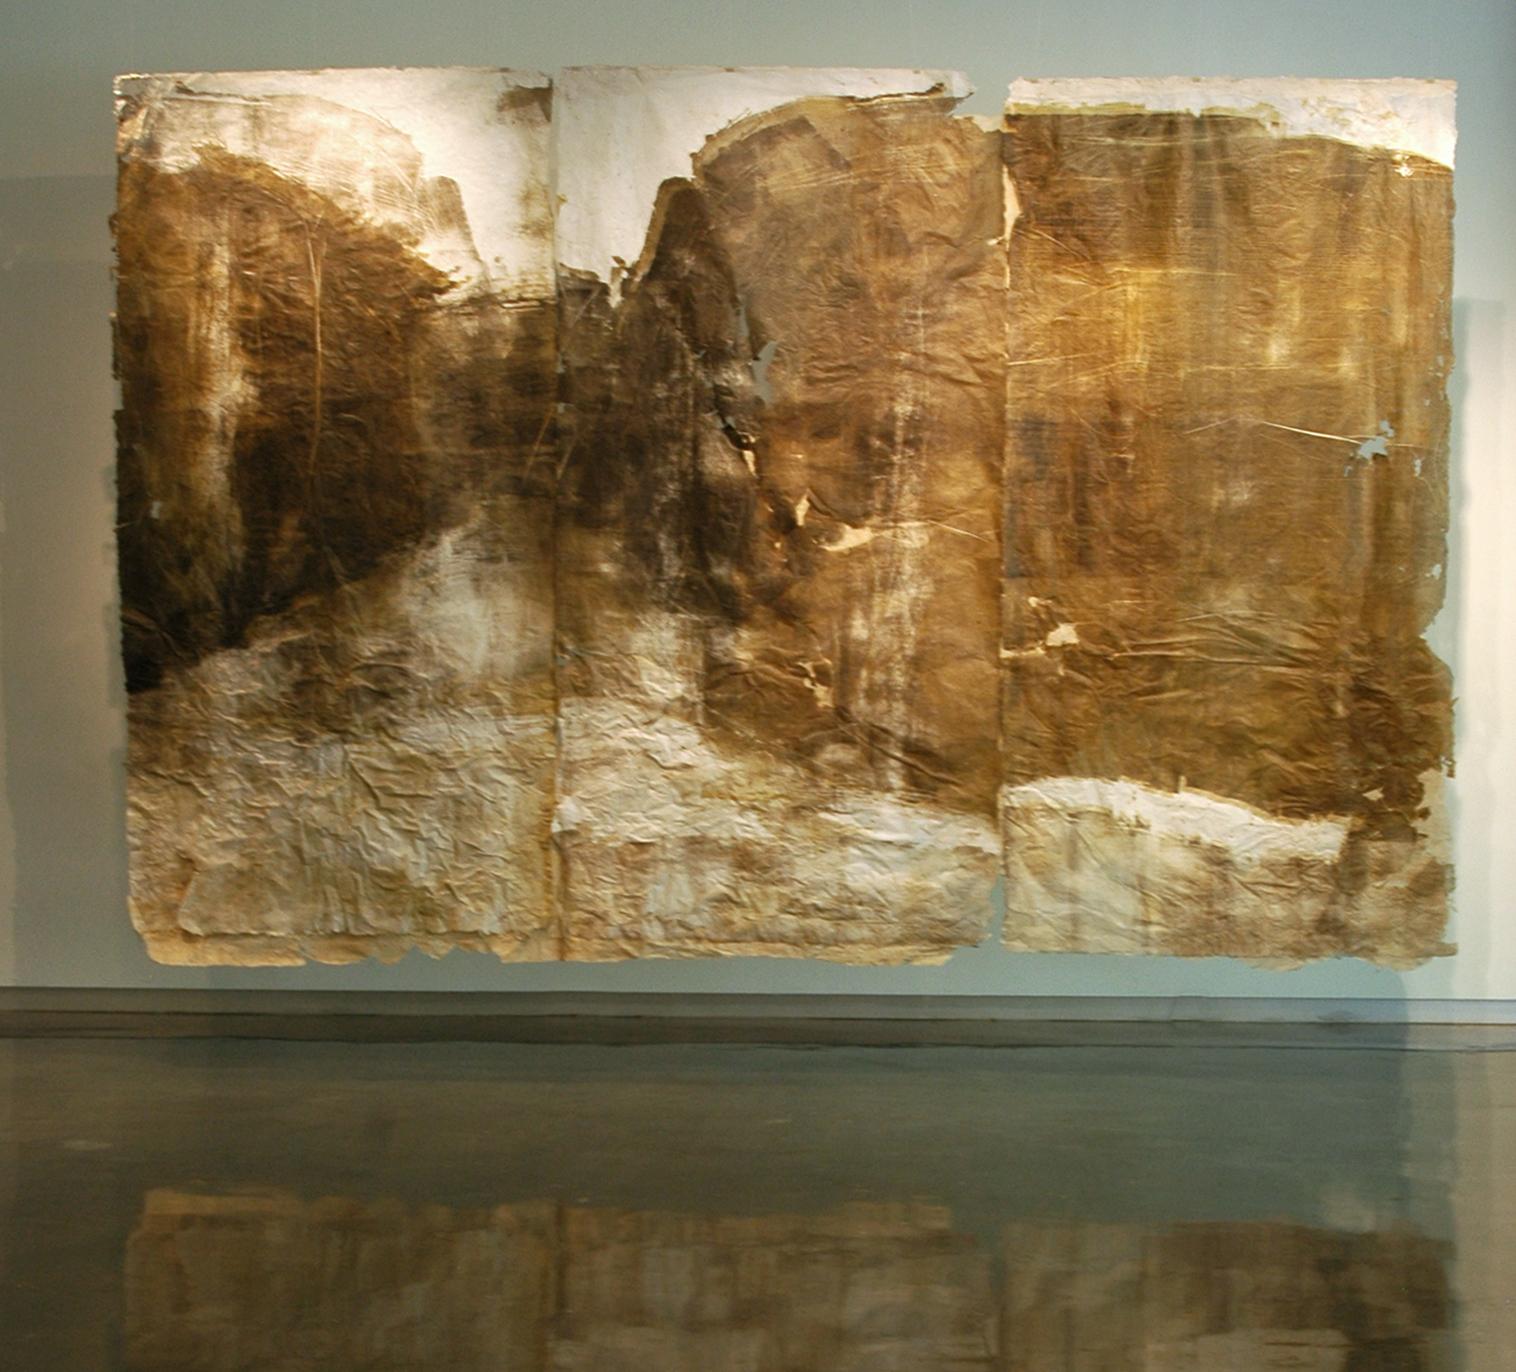 Plaquemine Lock 1, 2011, Woodcut and Handmade Paper, 8' x 12'